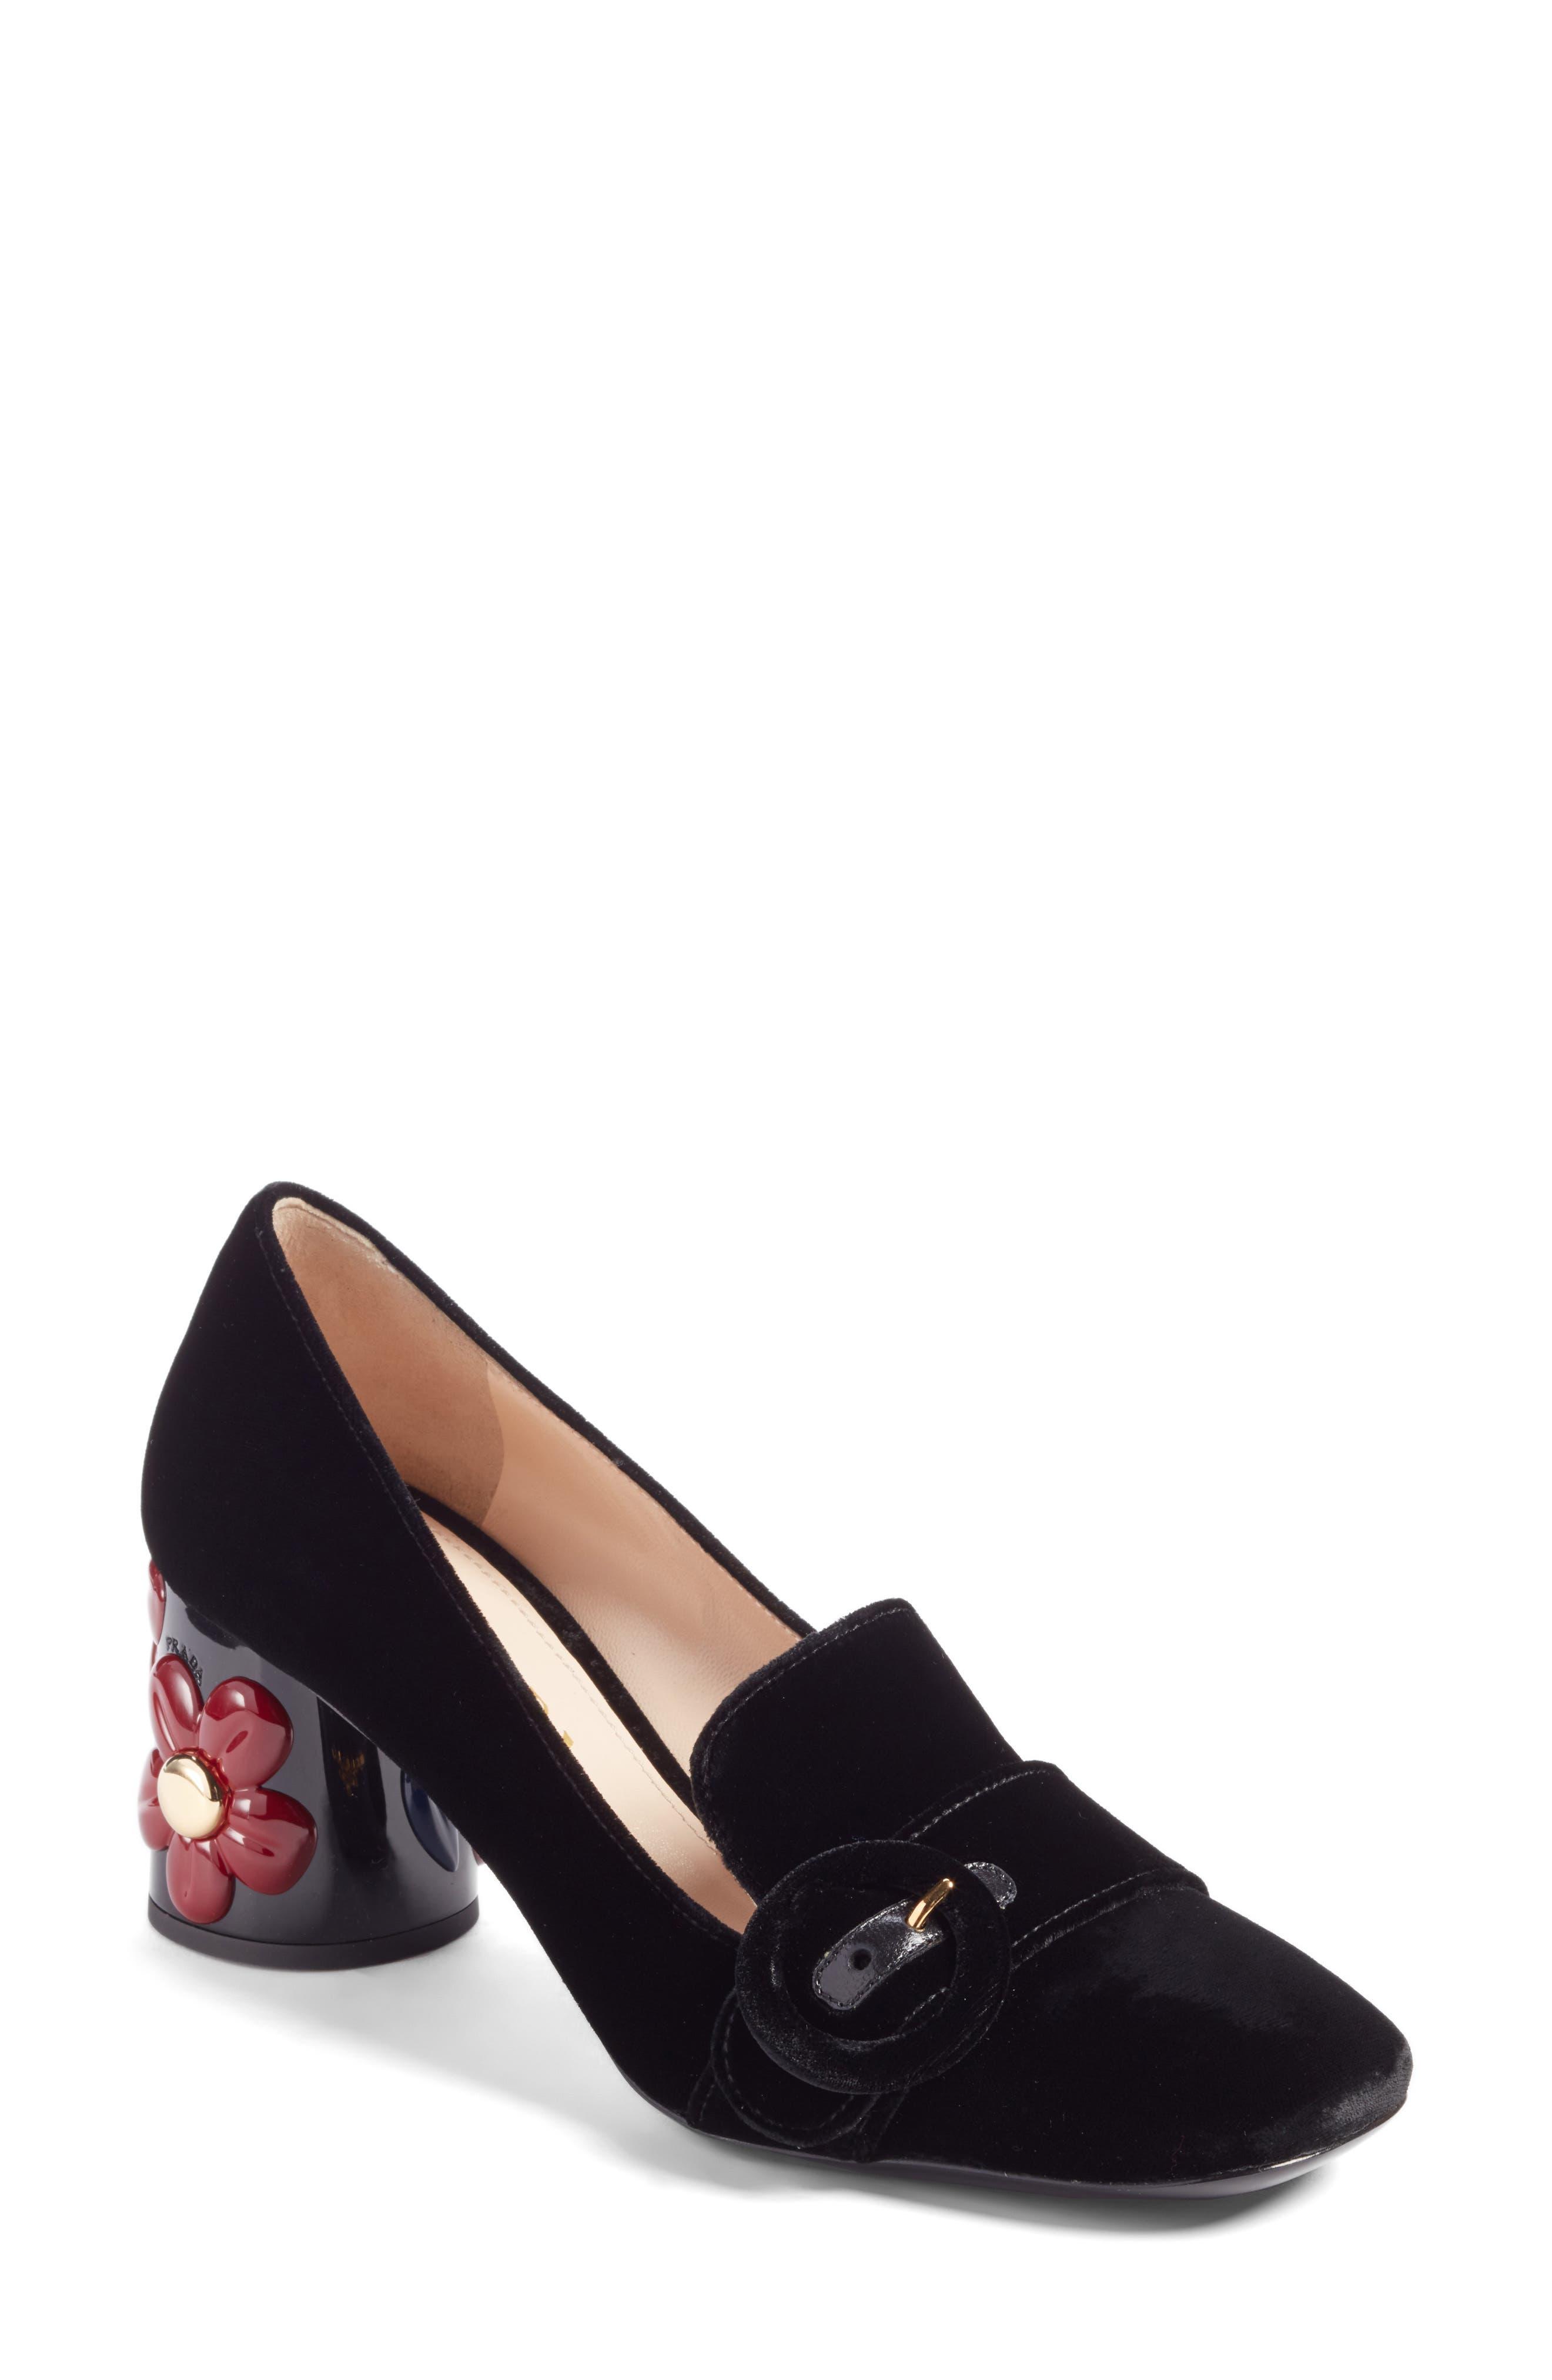 Prada Embellished Block Heel Loafer Pump (Women)